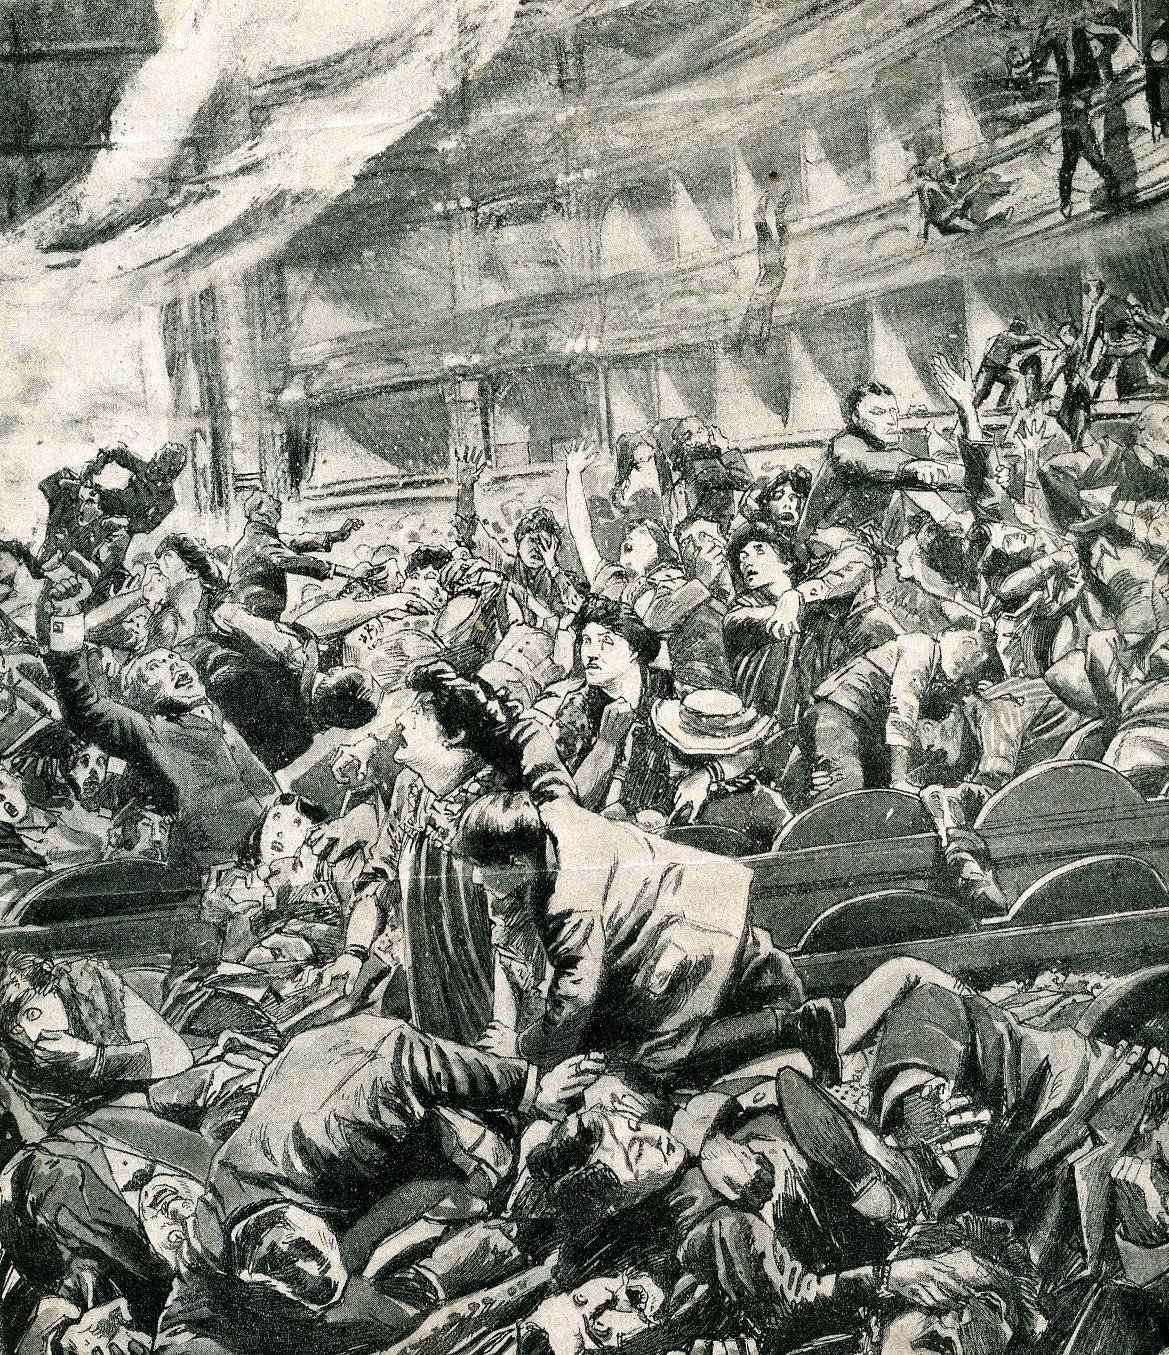 File:Incendie du théatre Iroquois (Chicago, 1904) jpg